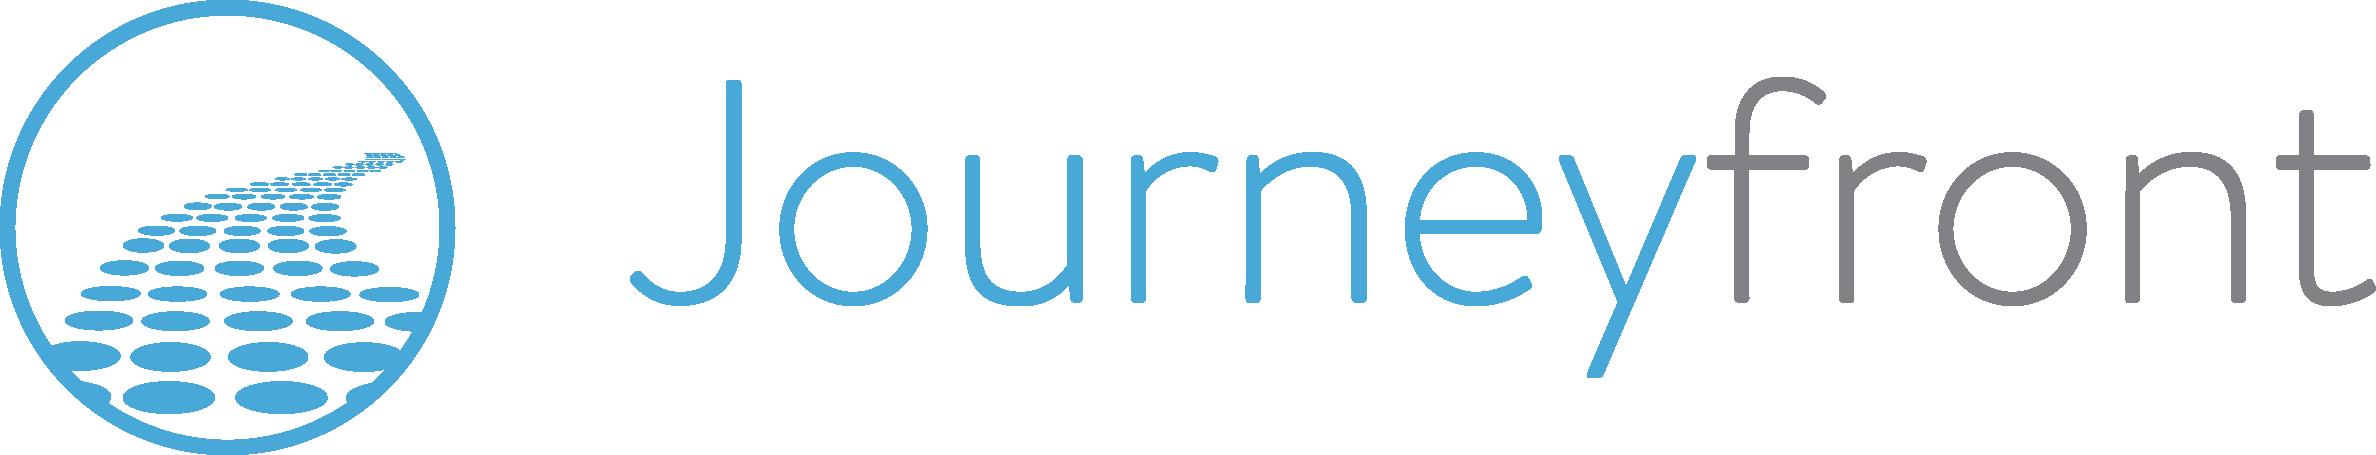 Journeyfront logo